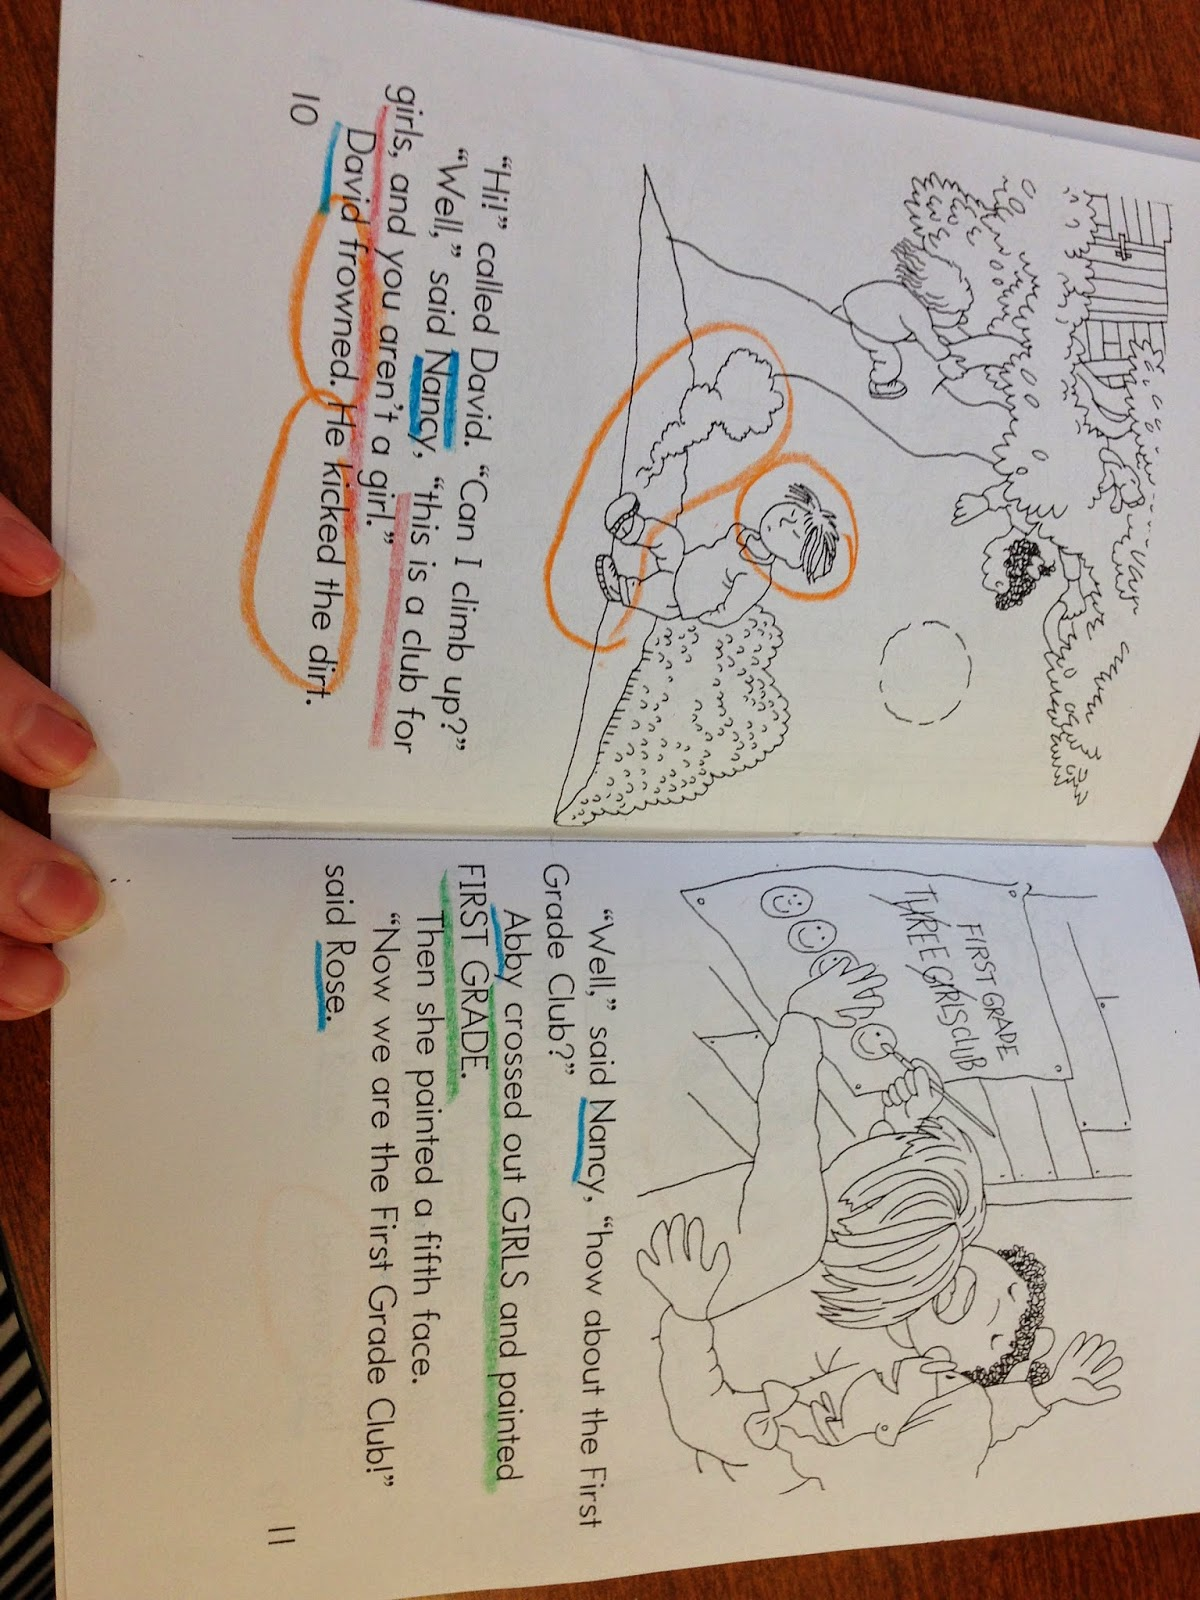 graphic regarding Free Printable Decodable Books for Kindergarten identified as Printable Decodable Kindergarten Guide